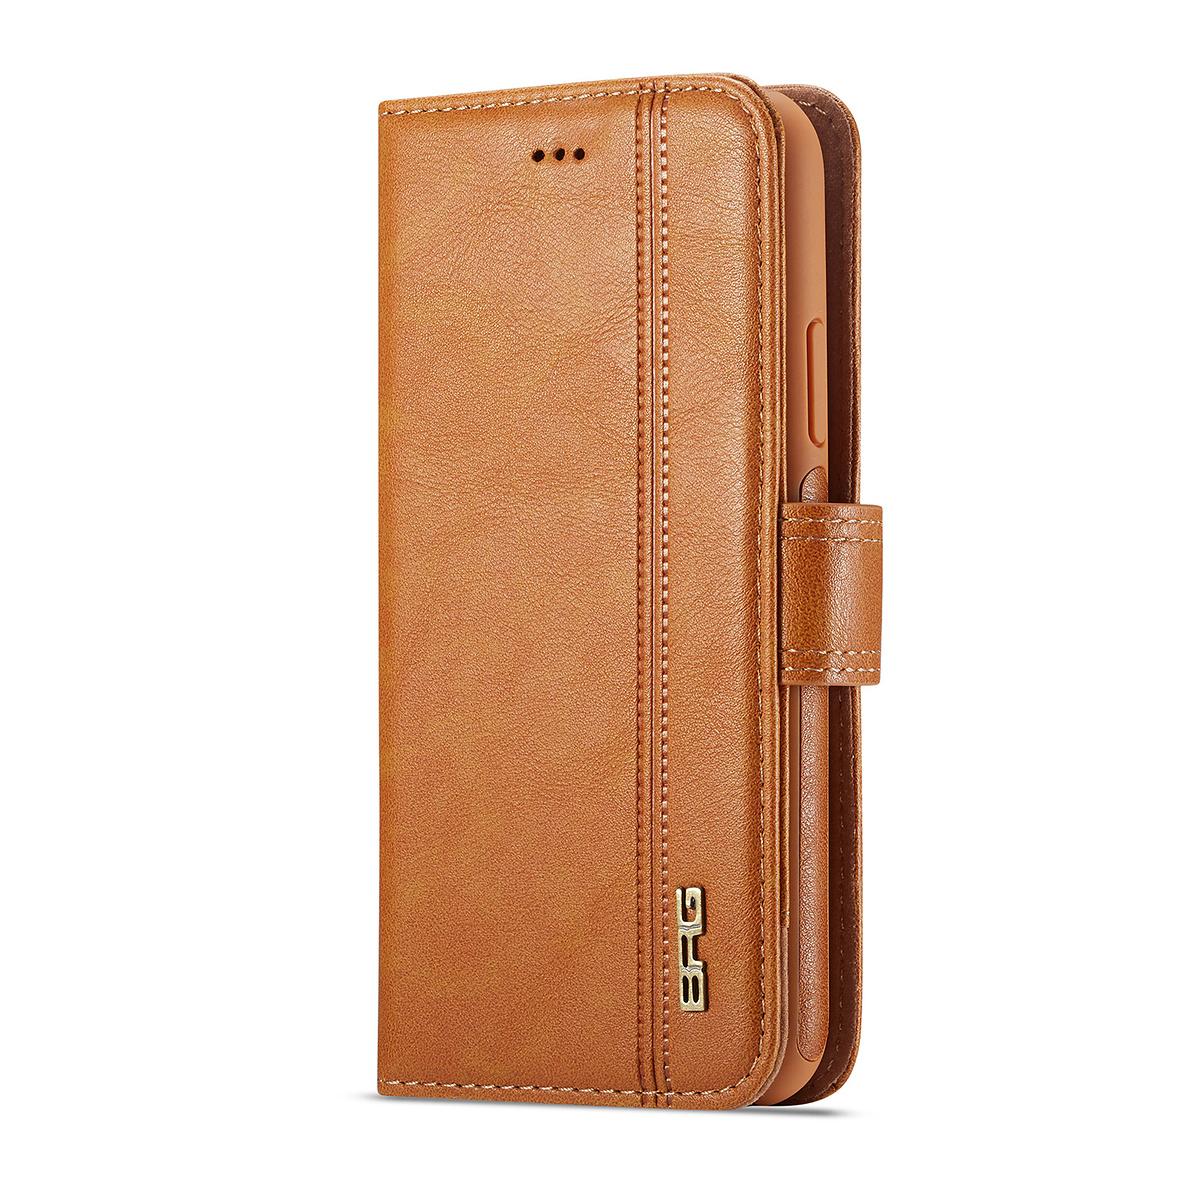 BRG Luxury plånboksfodral med ställ till iPhone X/XS, brun